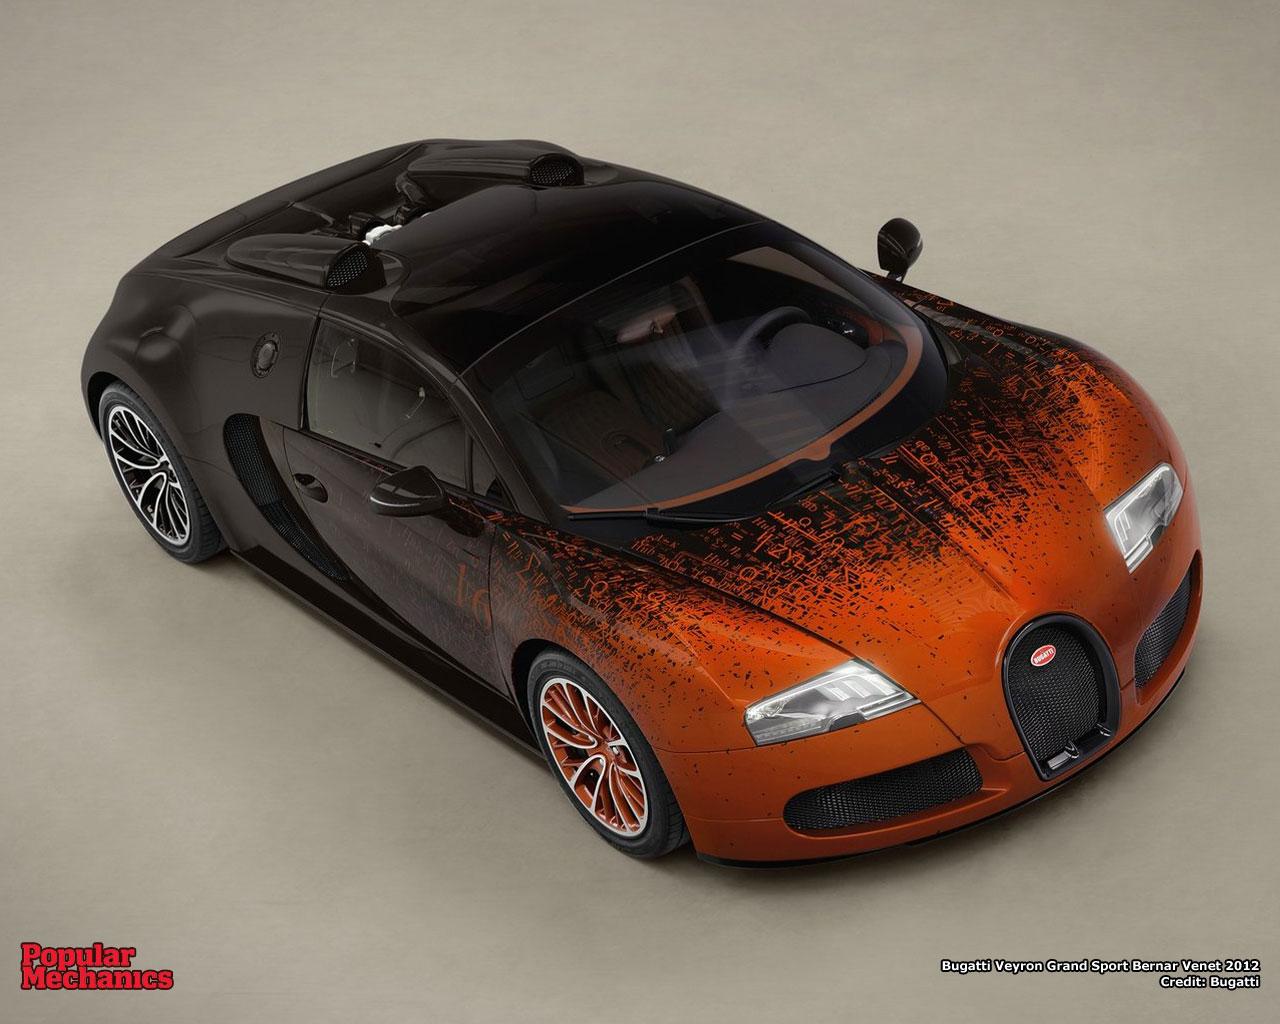 bugatti veyron grand sport bernar venet 2012 popular mechanics. Black Bedroom Furniture Sets. Home Design Ideas